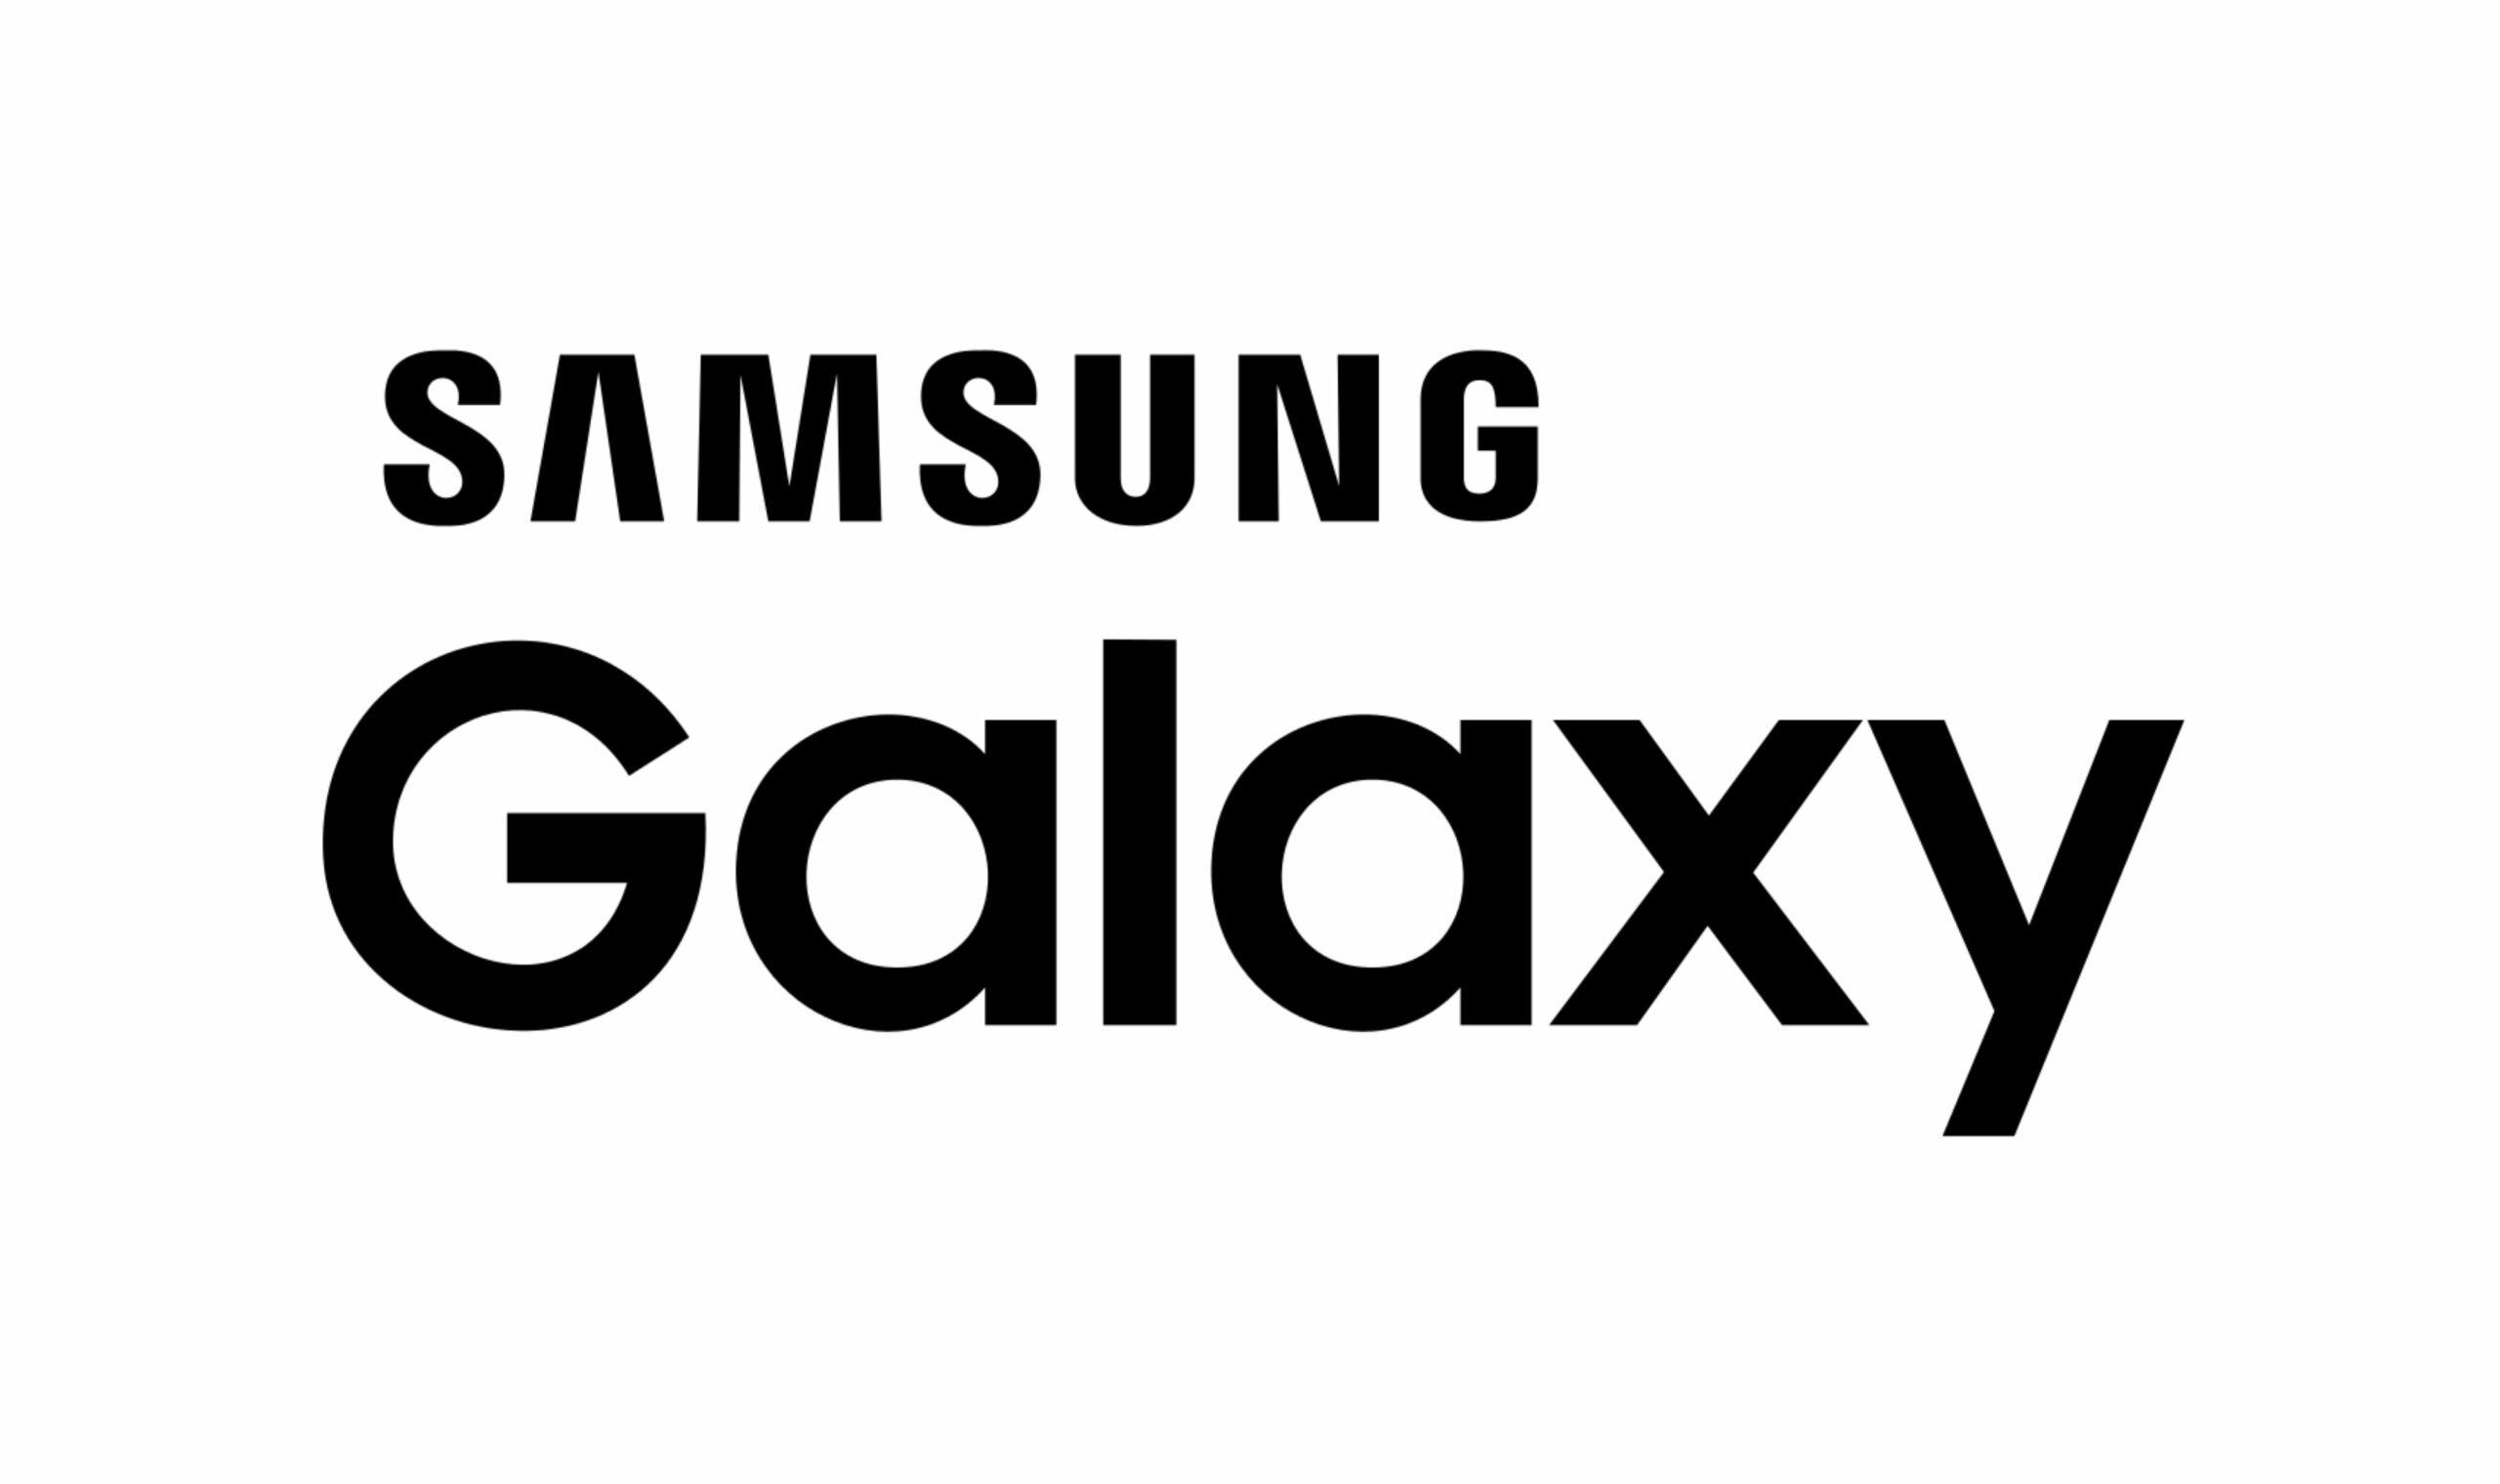 Samsung Galaxy Logo Featured